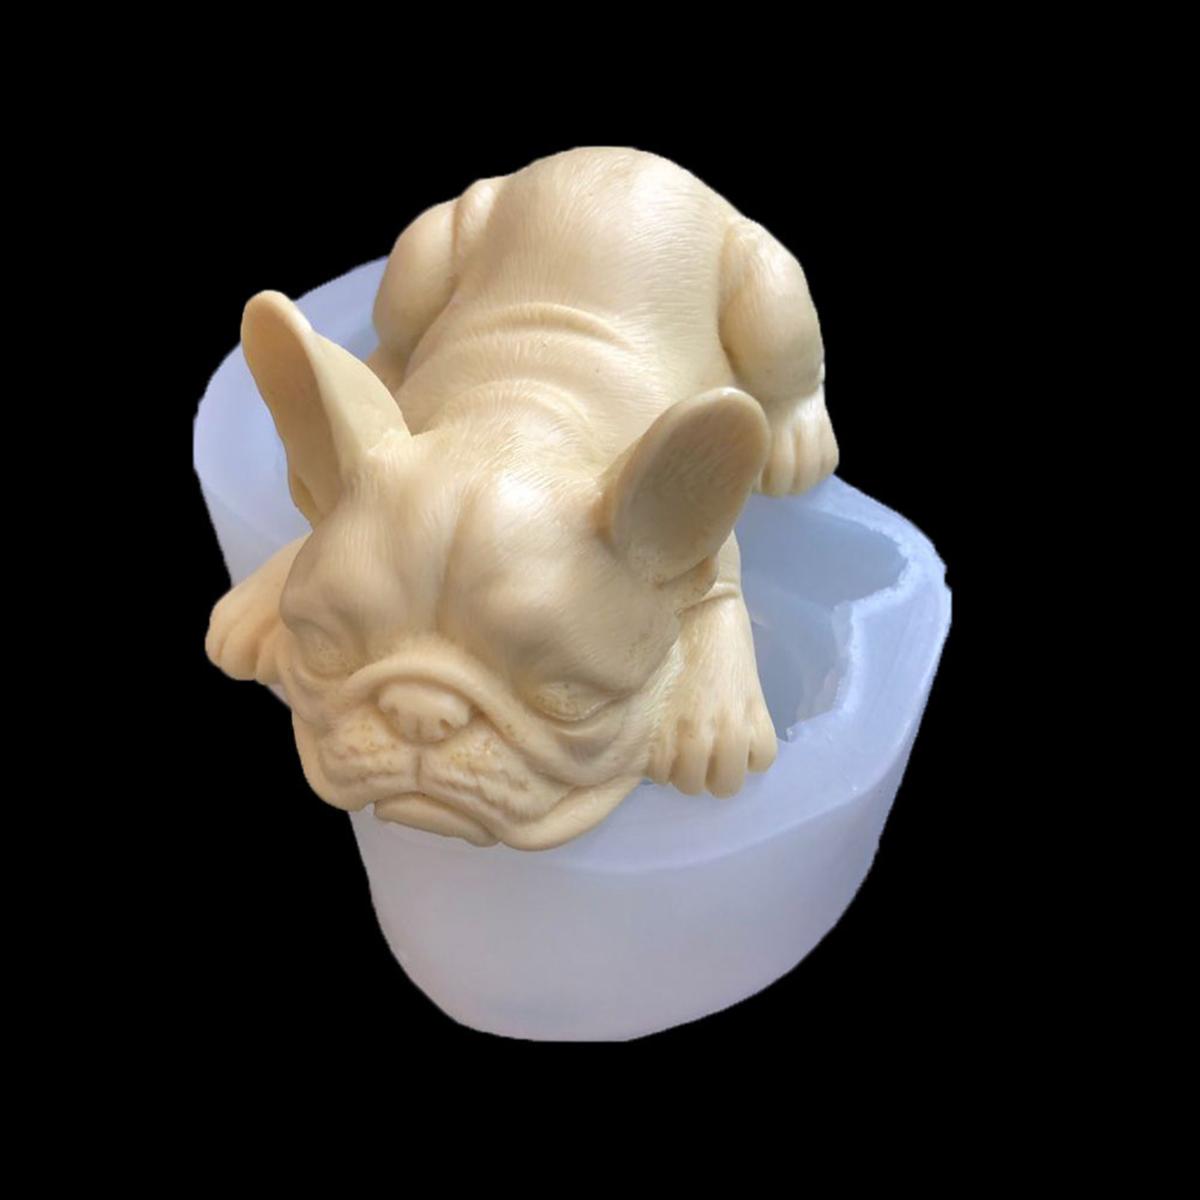 Bull Dog Silicone Soap Mold Animal Chocolate Model Cake Mould Decor DIY Baking Tool